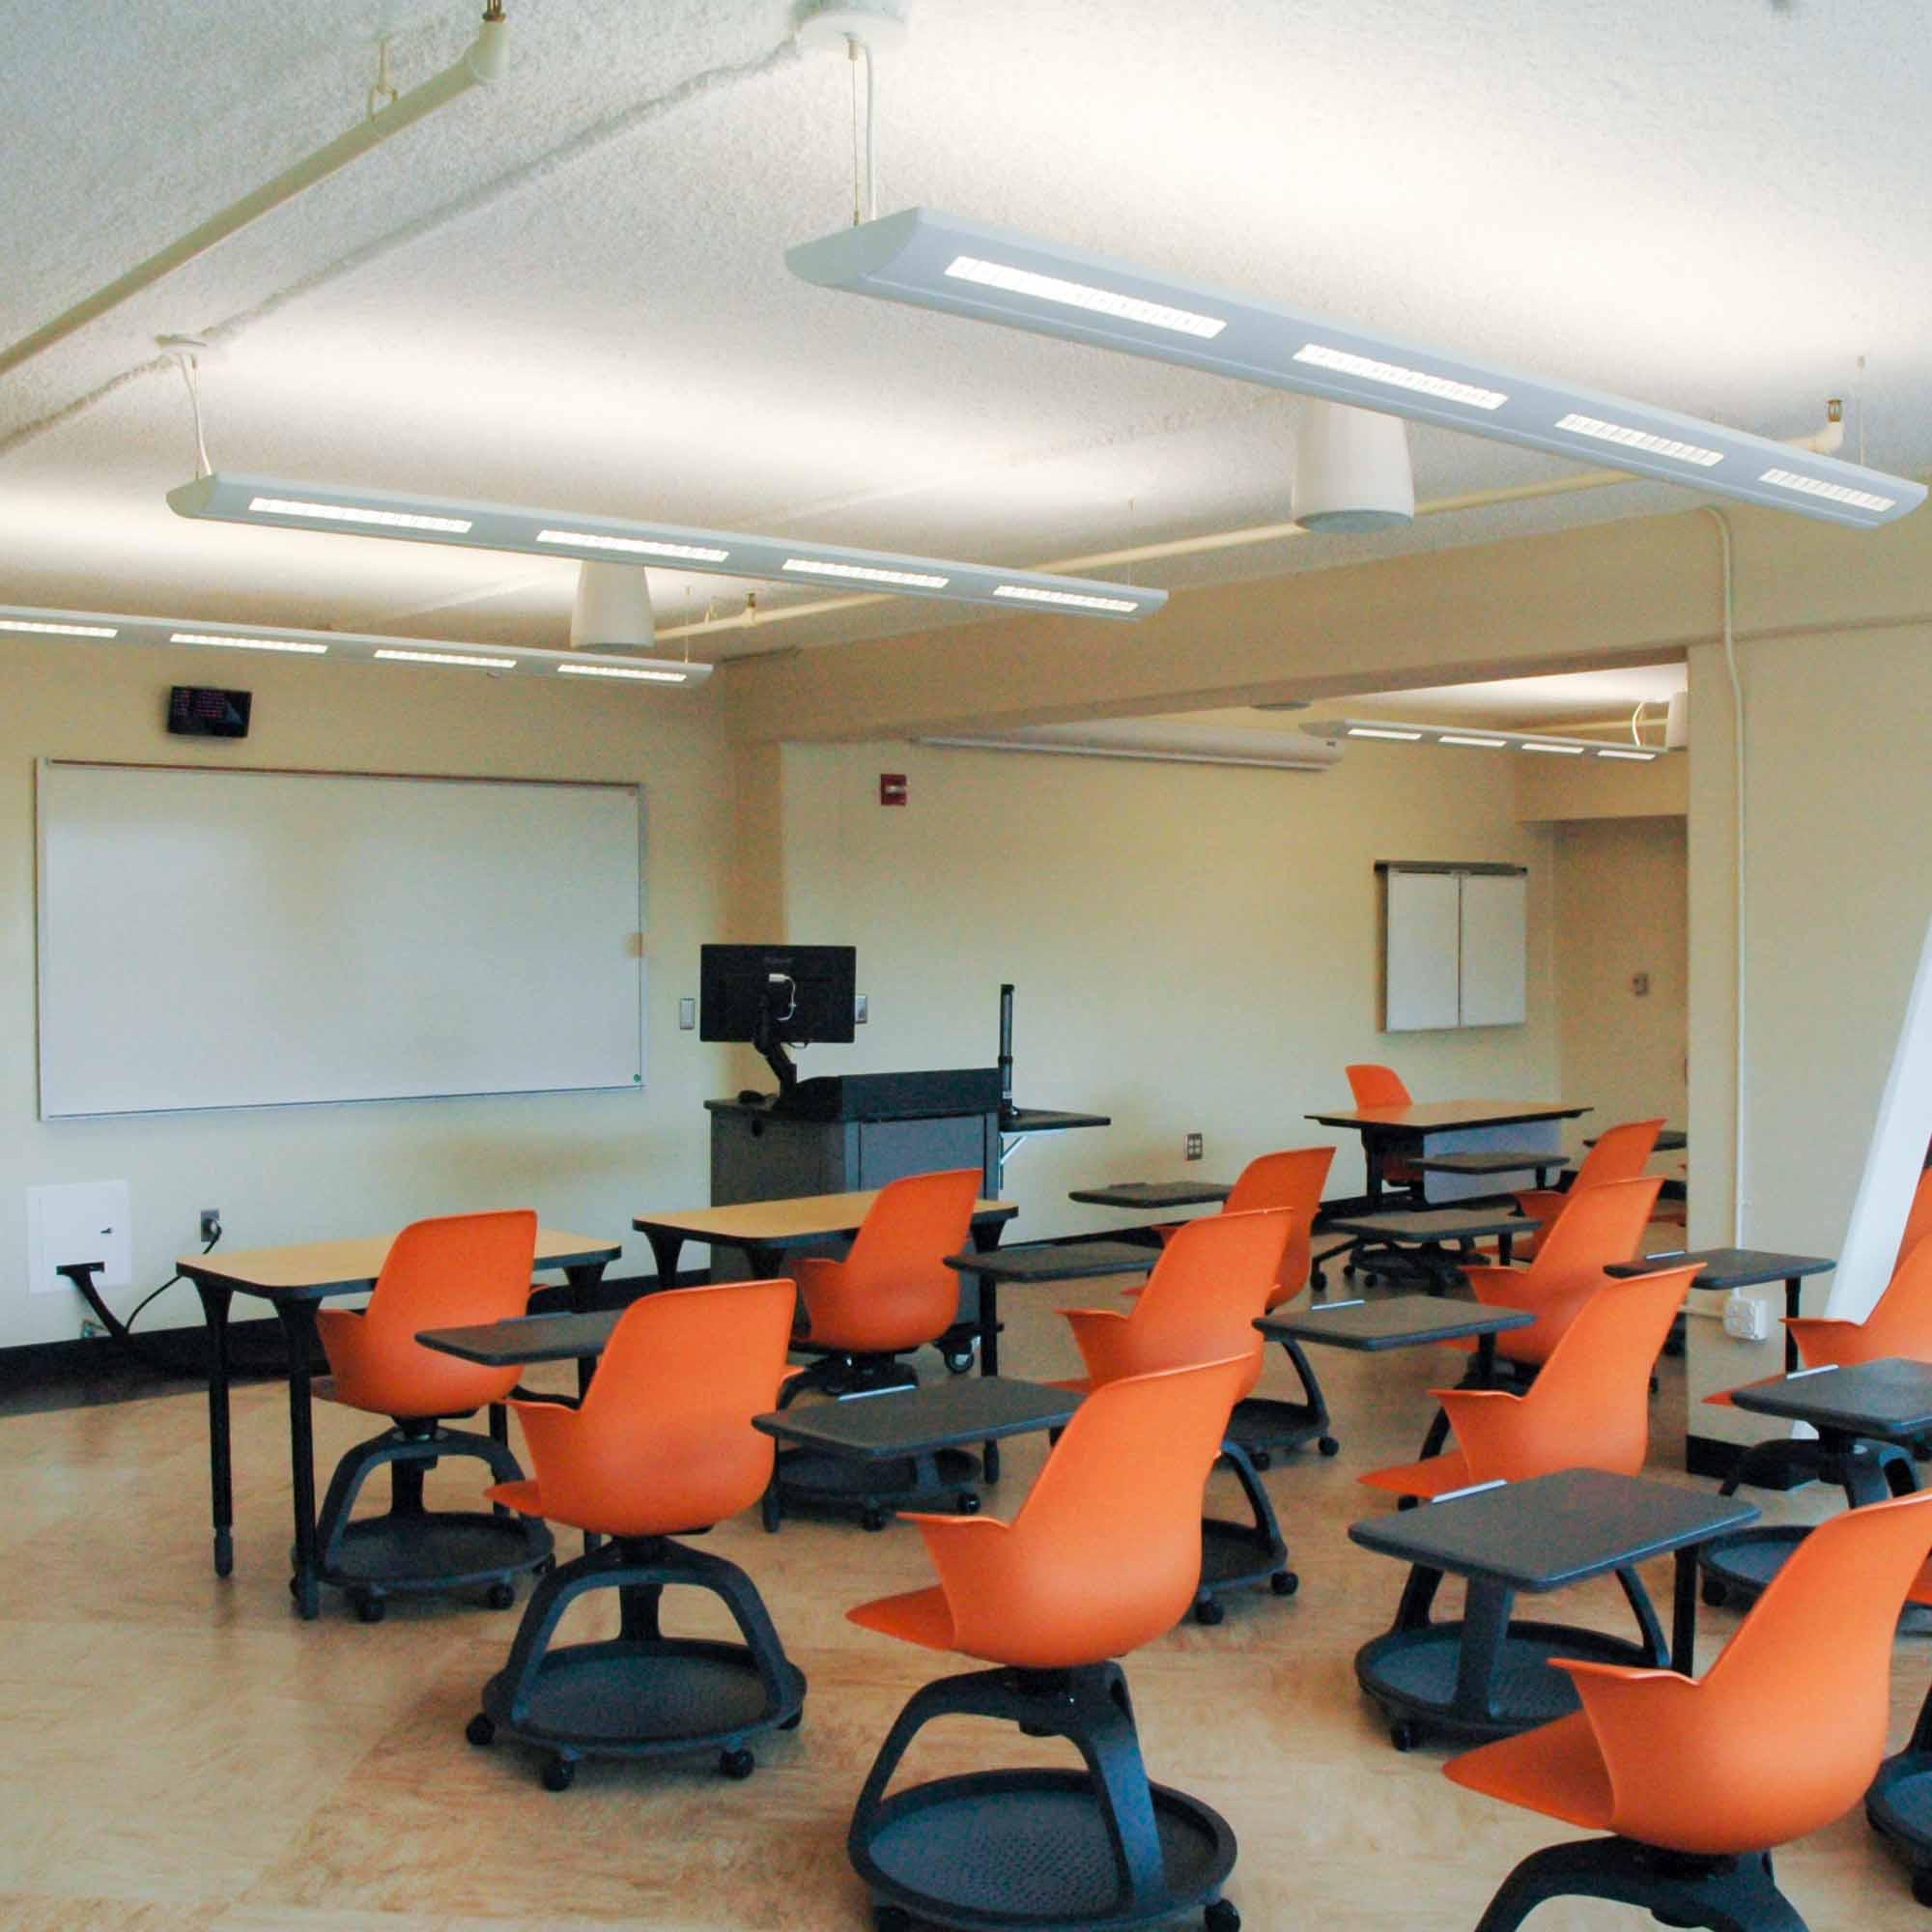 University Classroom Interior